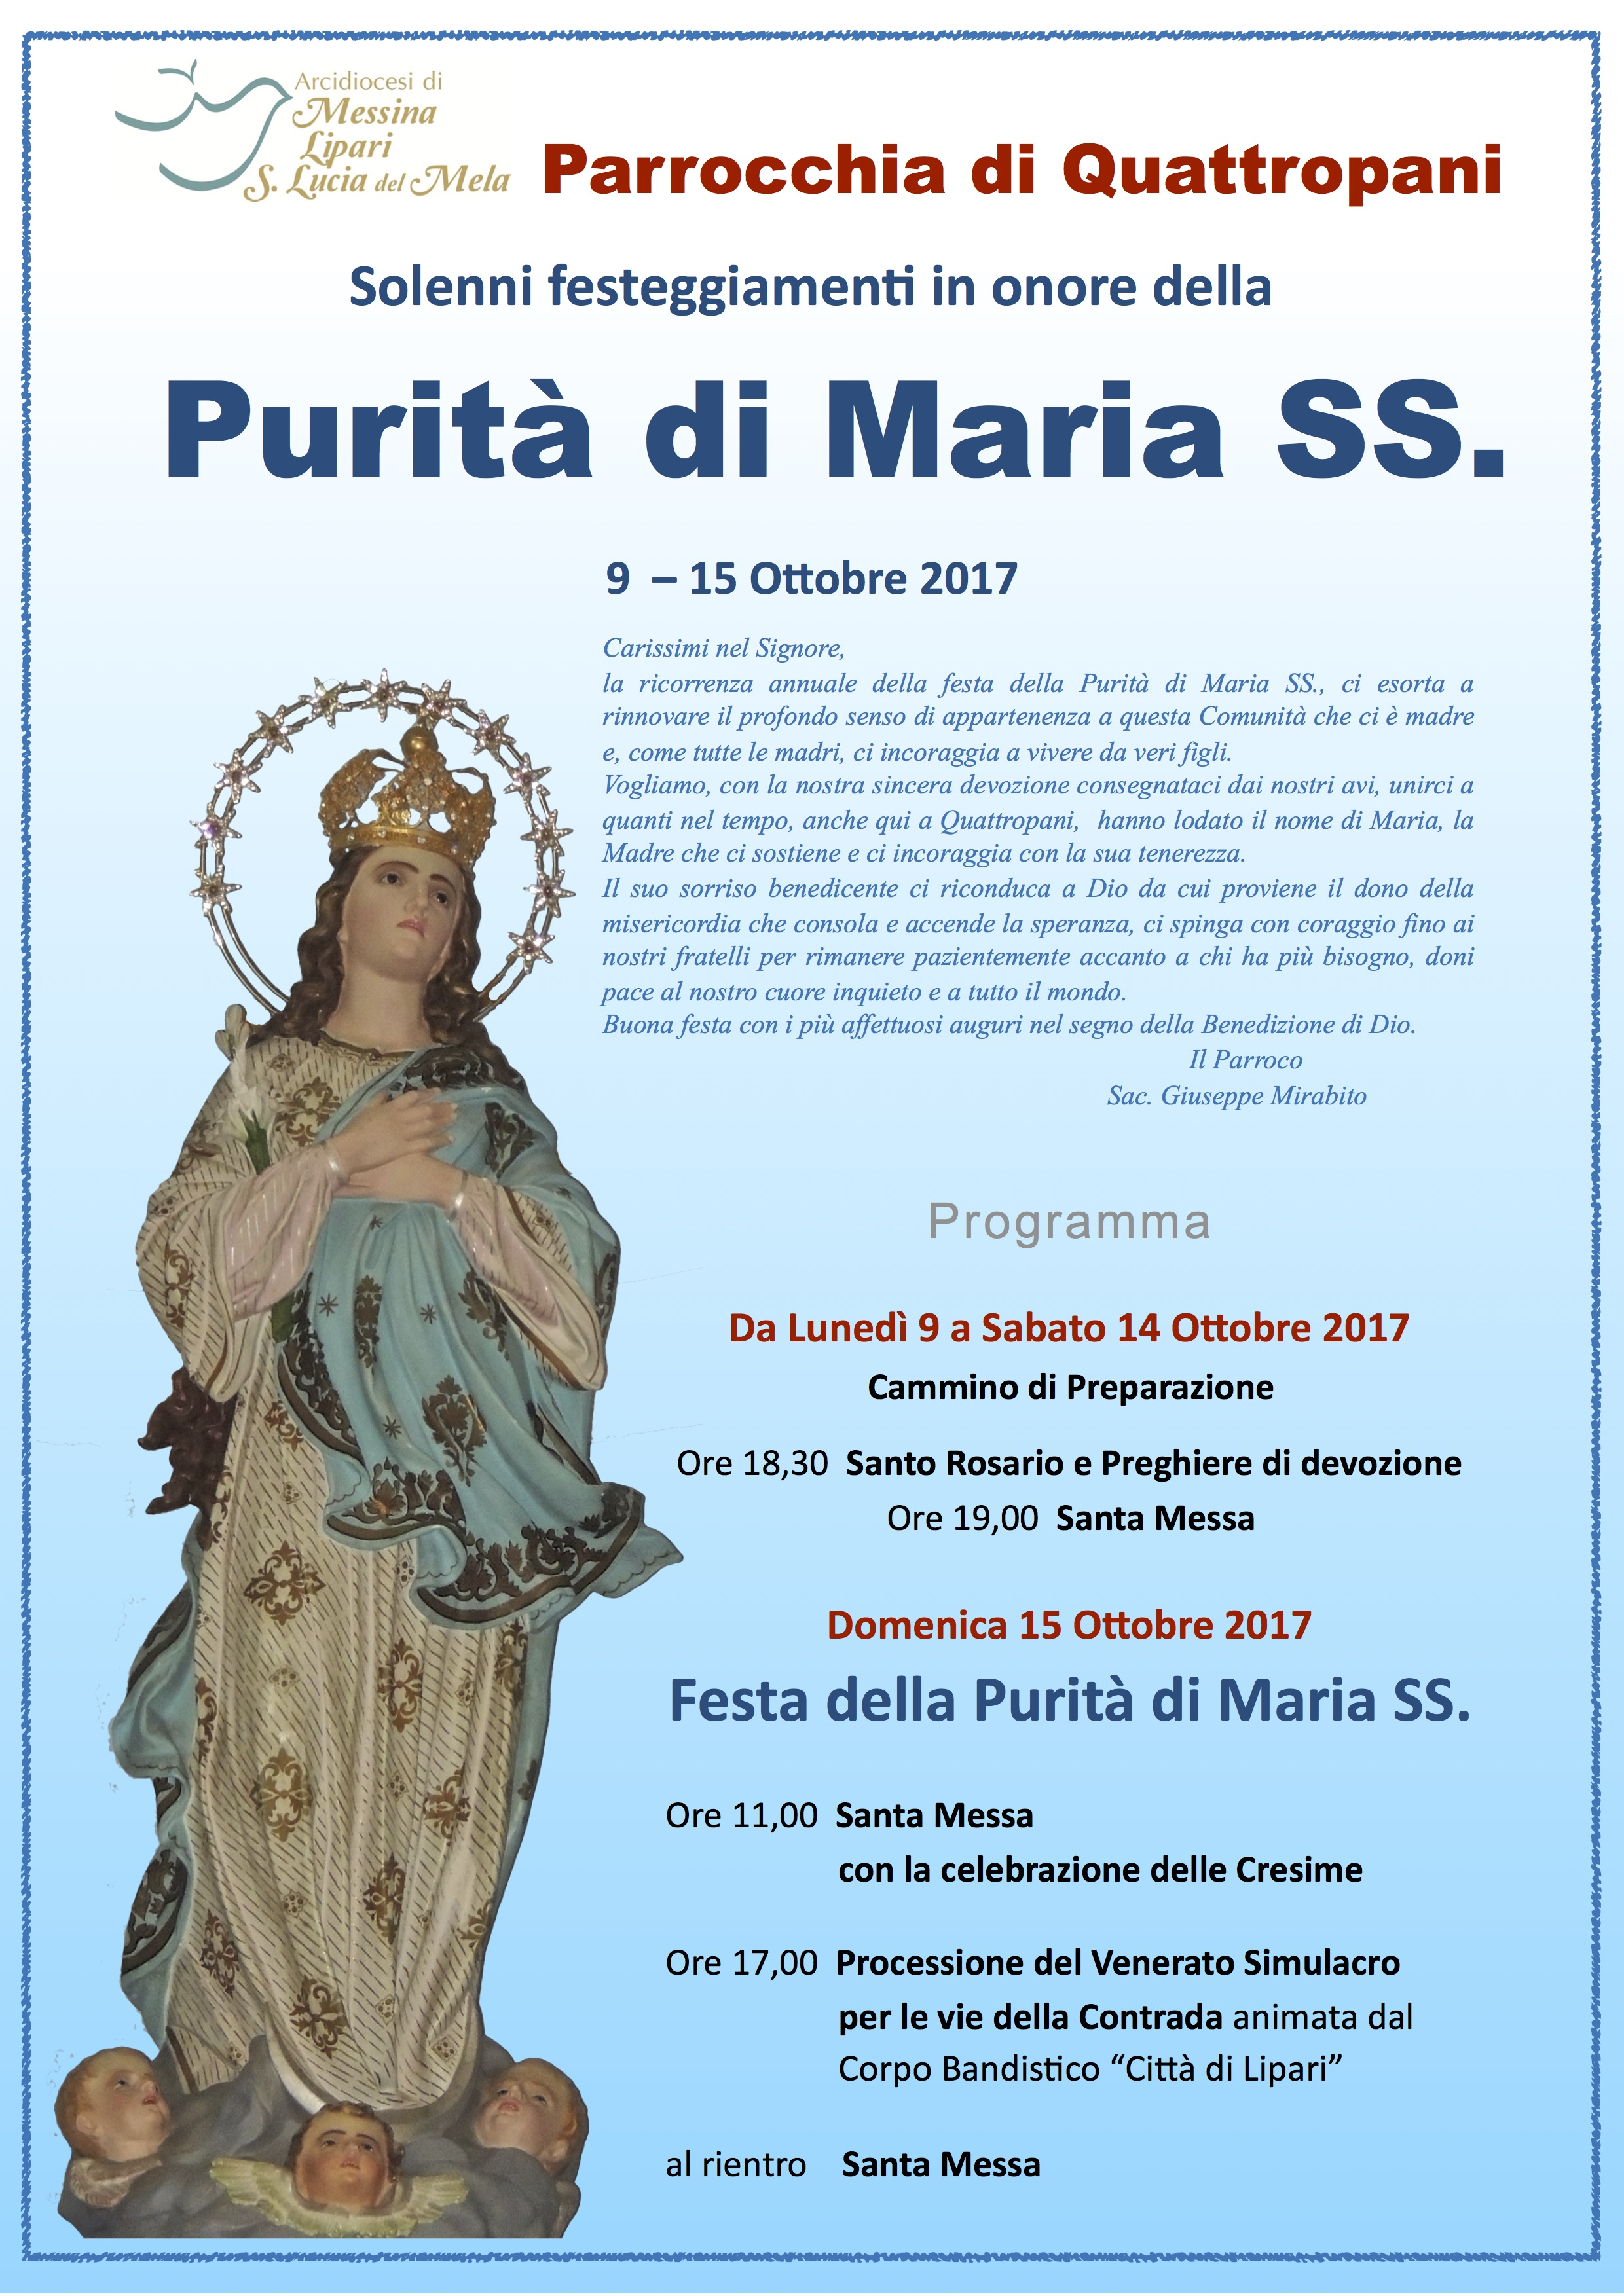 Purita 2017 (4)